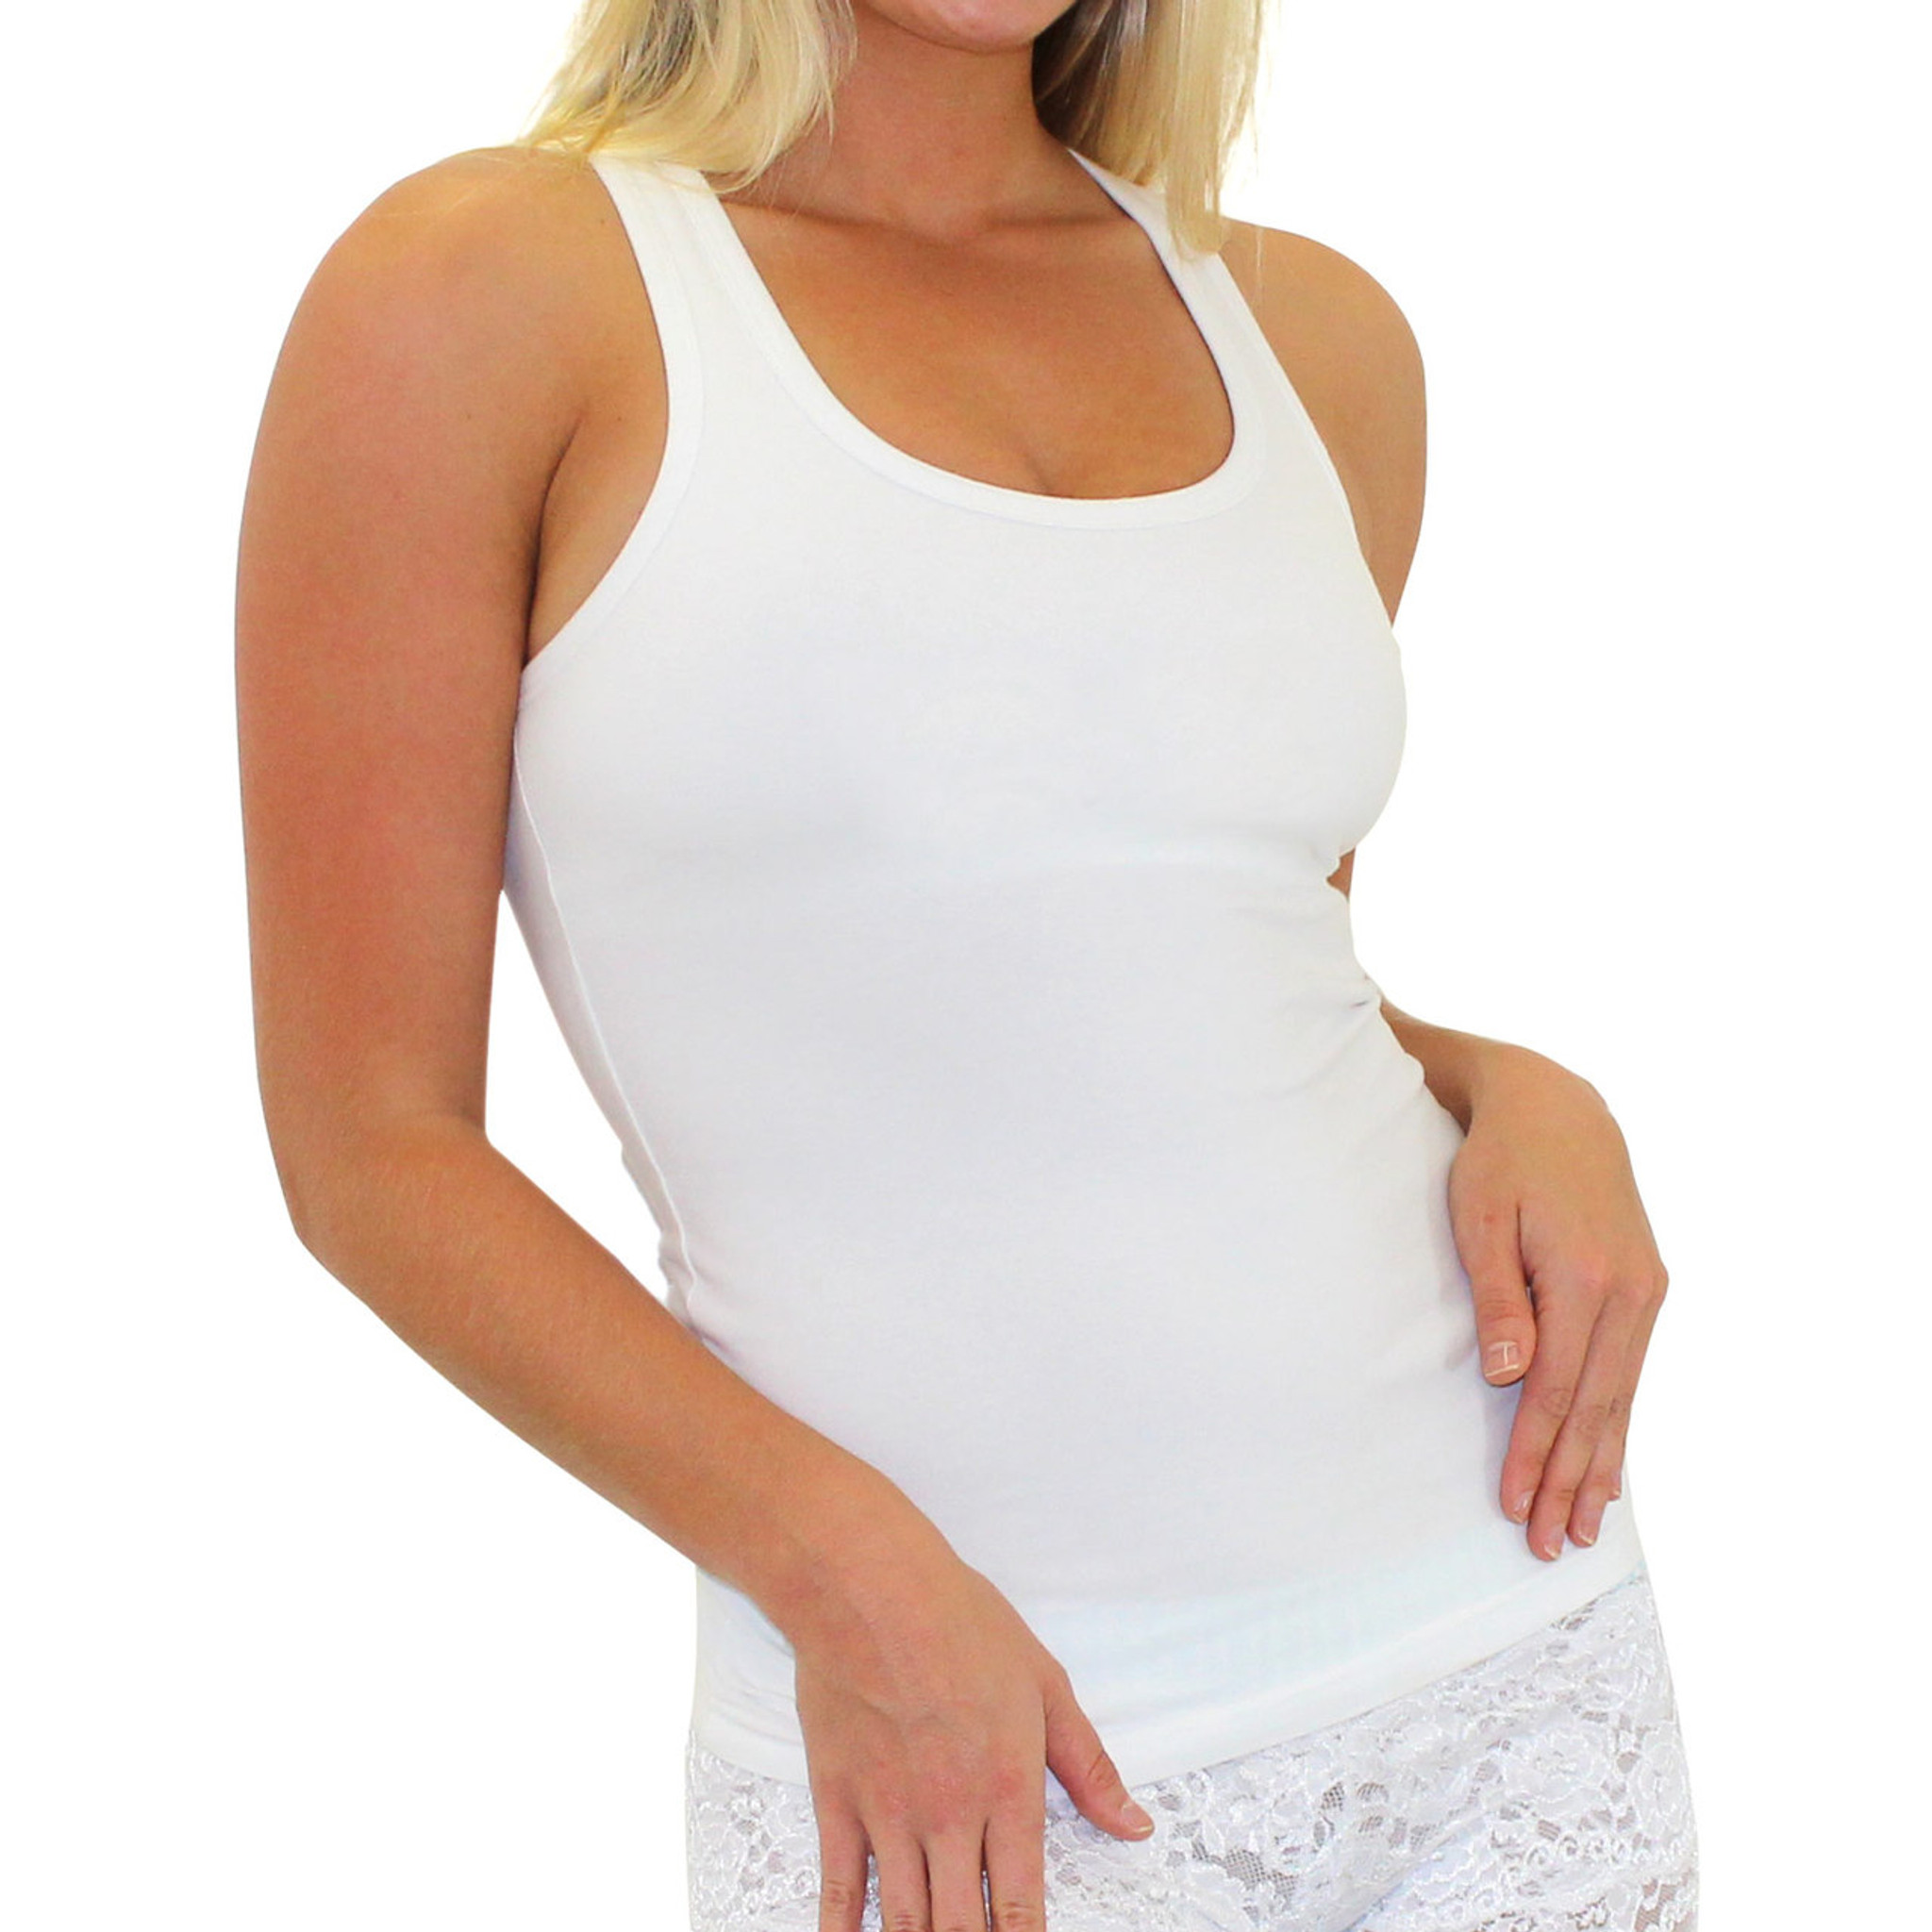 Women Plus Size Cami Built in Shelf Bra Adjustable ... |With Shelf Bra Tank Top